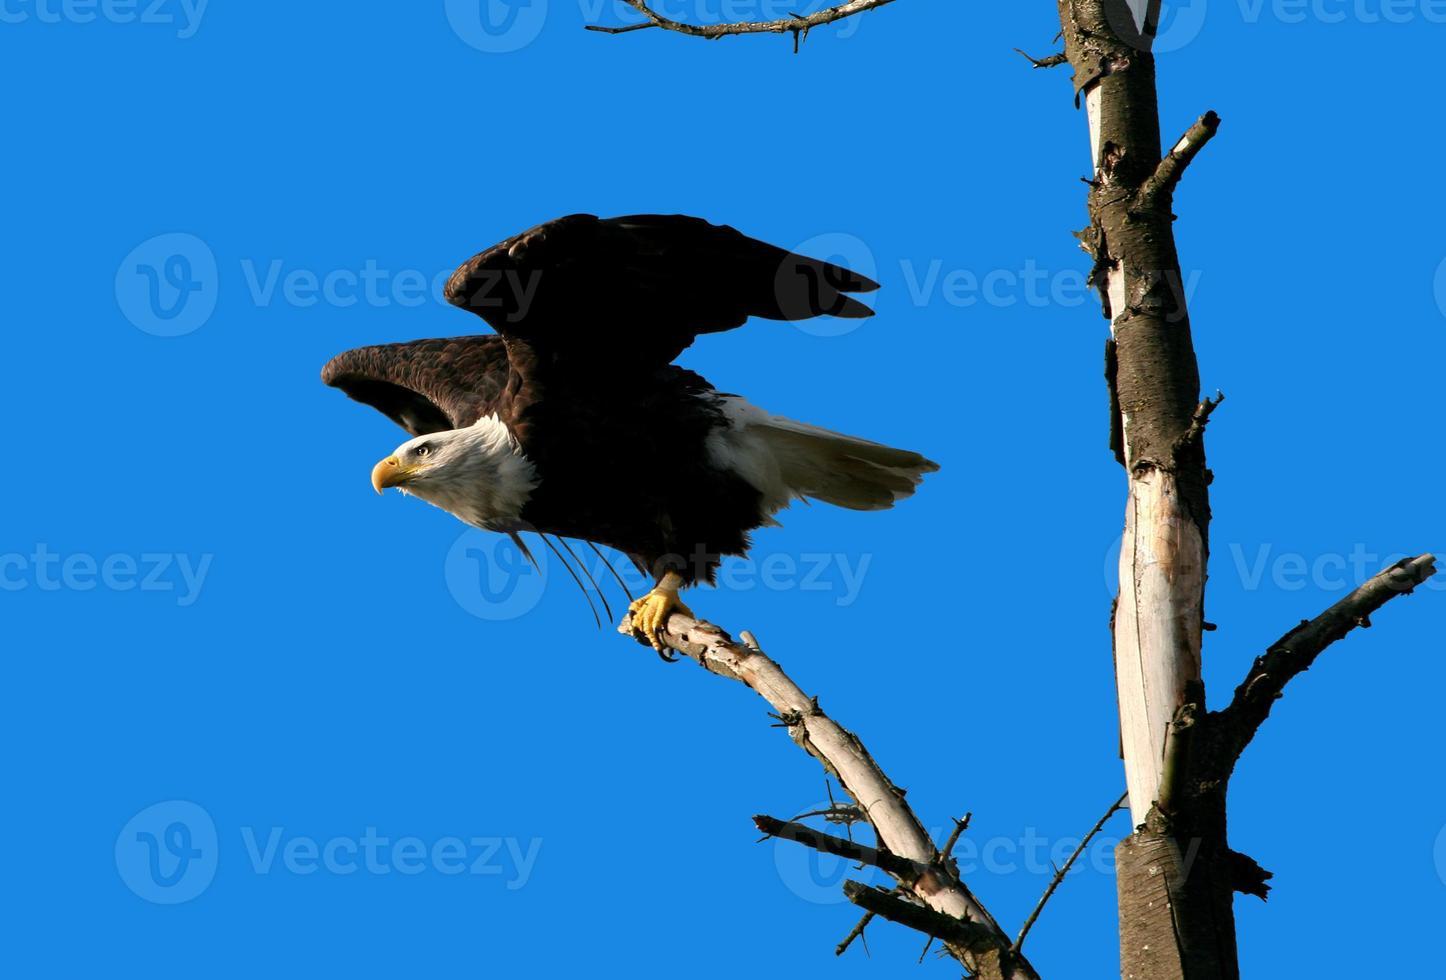 águila lista para despegar foto